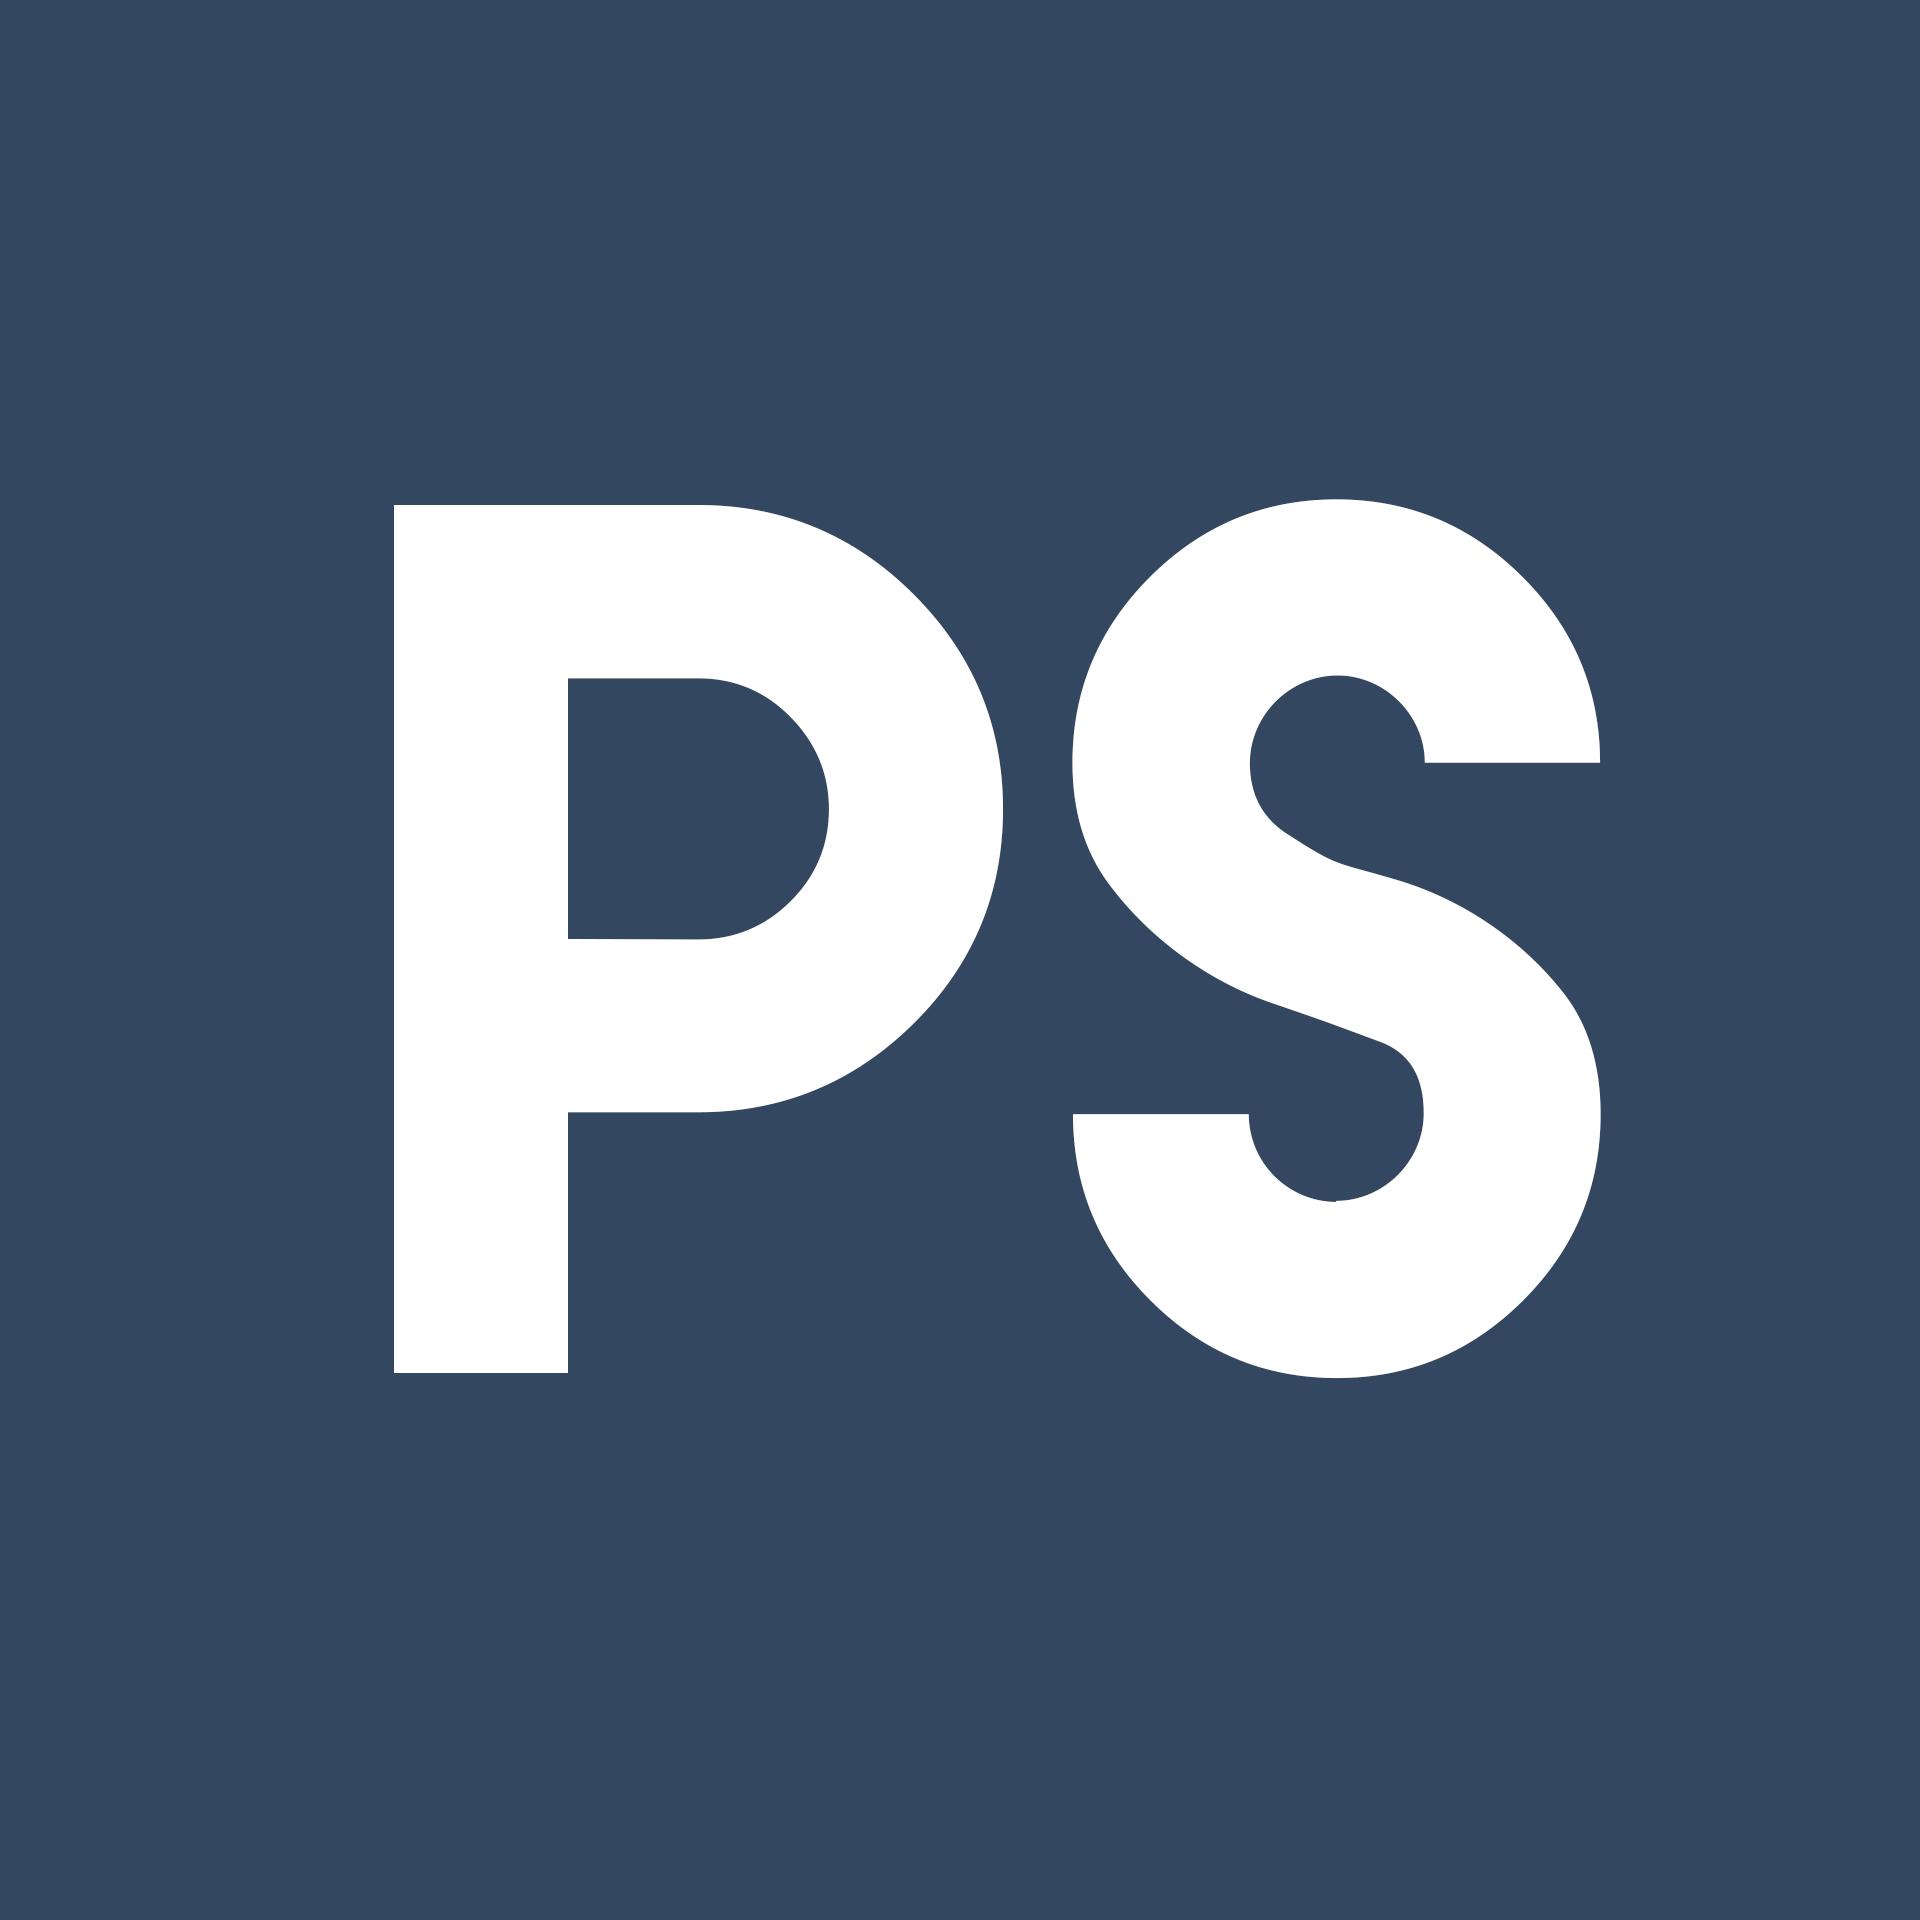 PS海报PS免费版 1.2.2